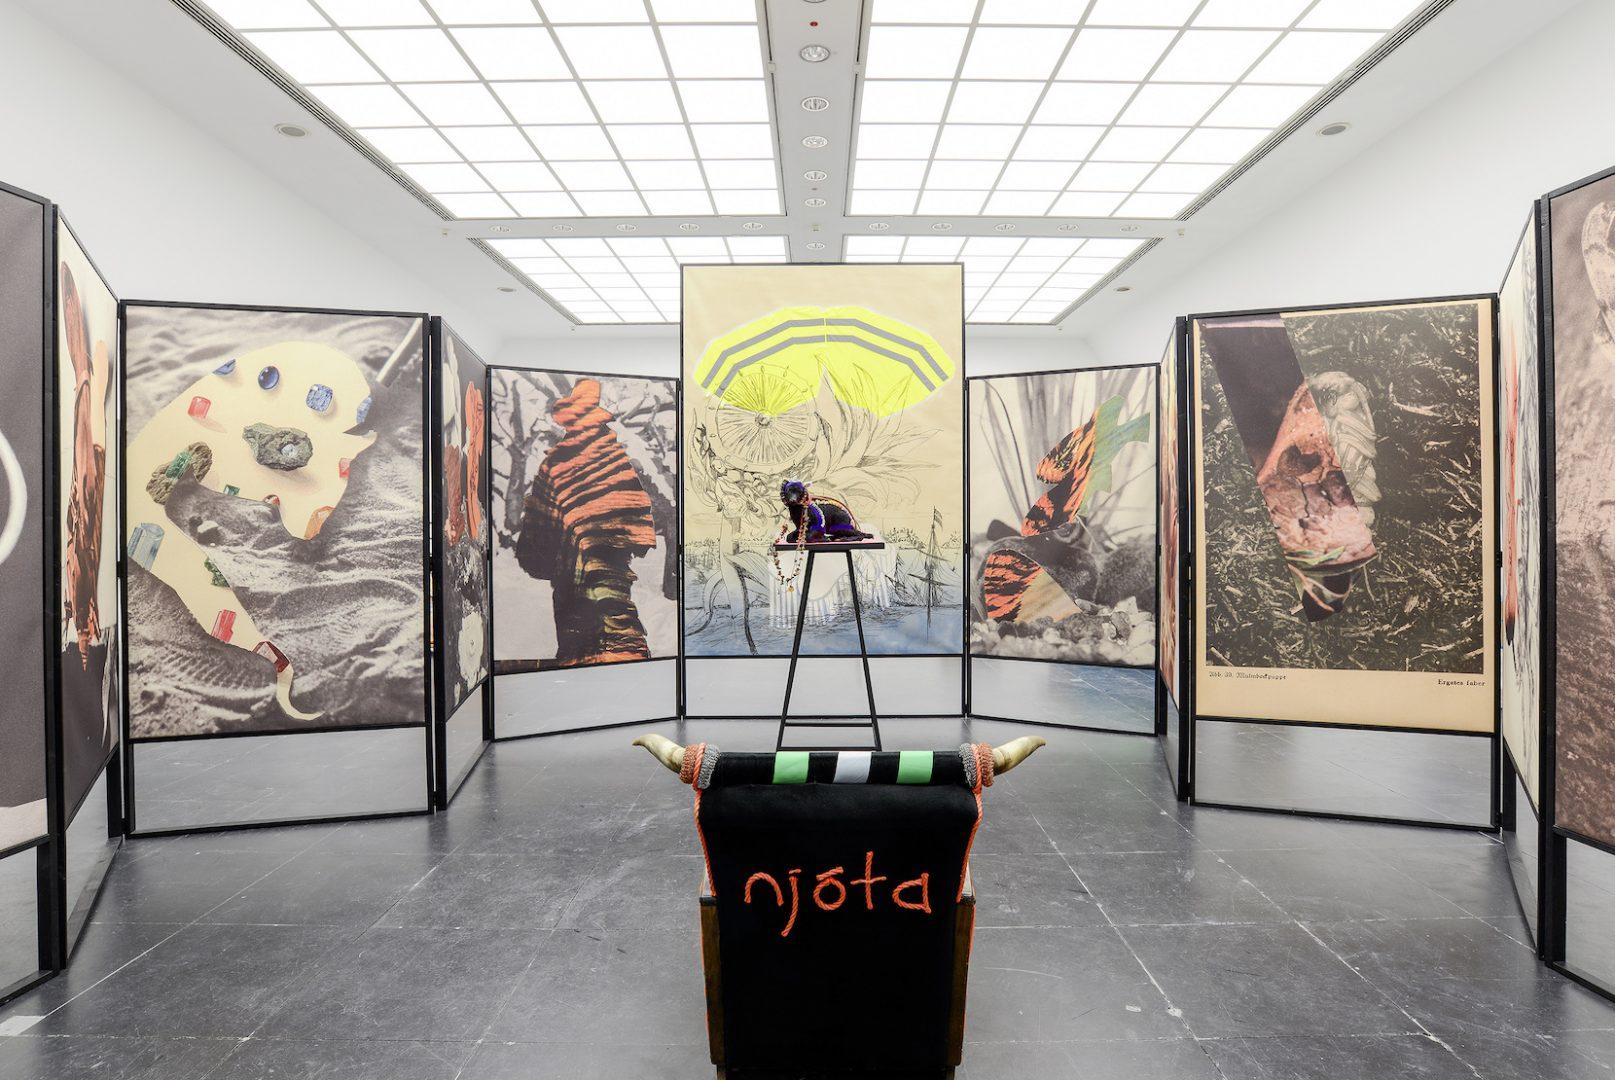 "Helga Schmidhuber, Installationsansicht ""Does Voodoo work? II"", Frankfurter Kunstverein, 2015, photo credit: Holger Schmidhuber"